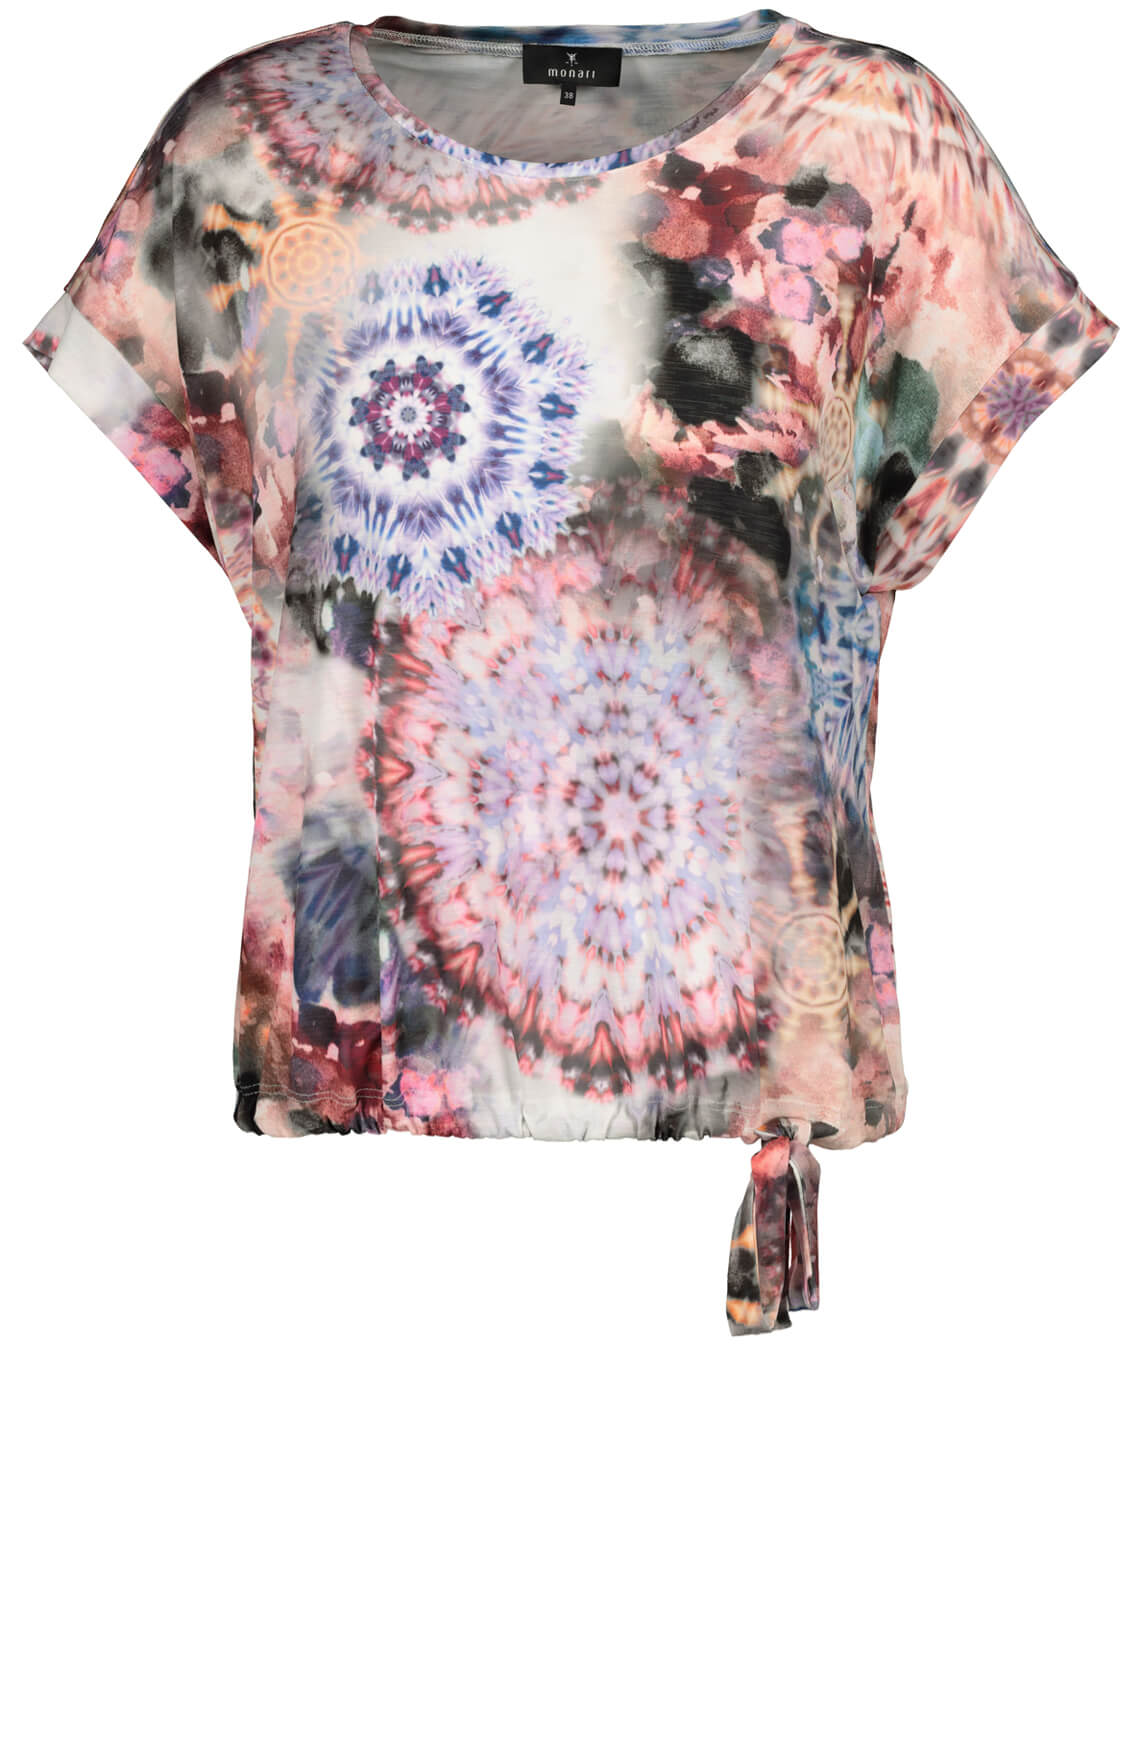 Monari Dames Tie dye shirt Paars